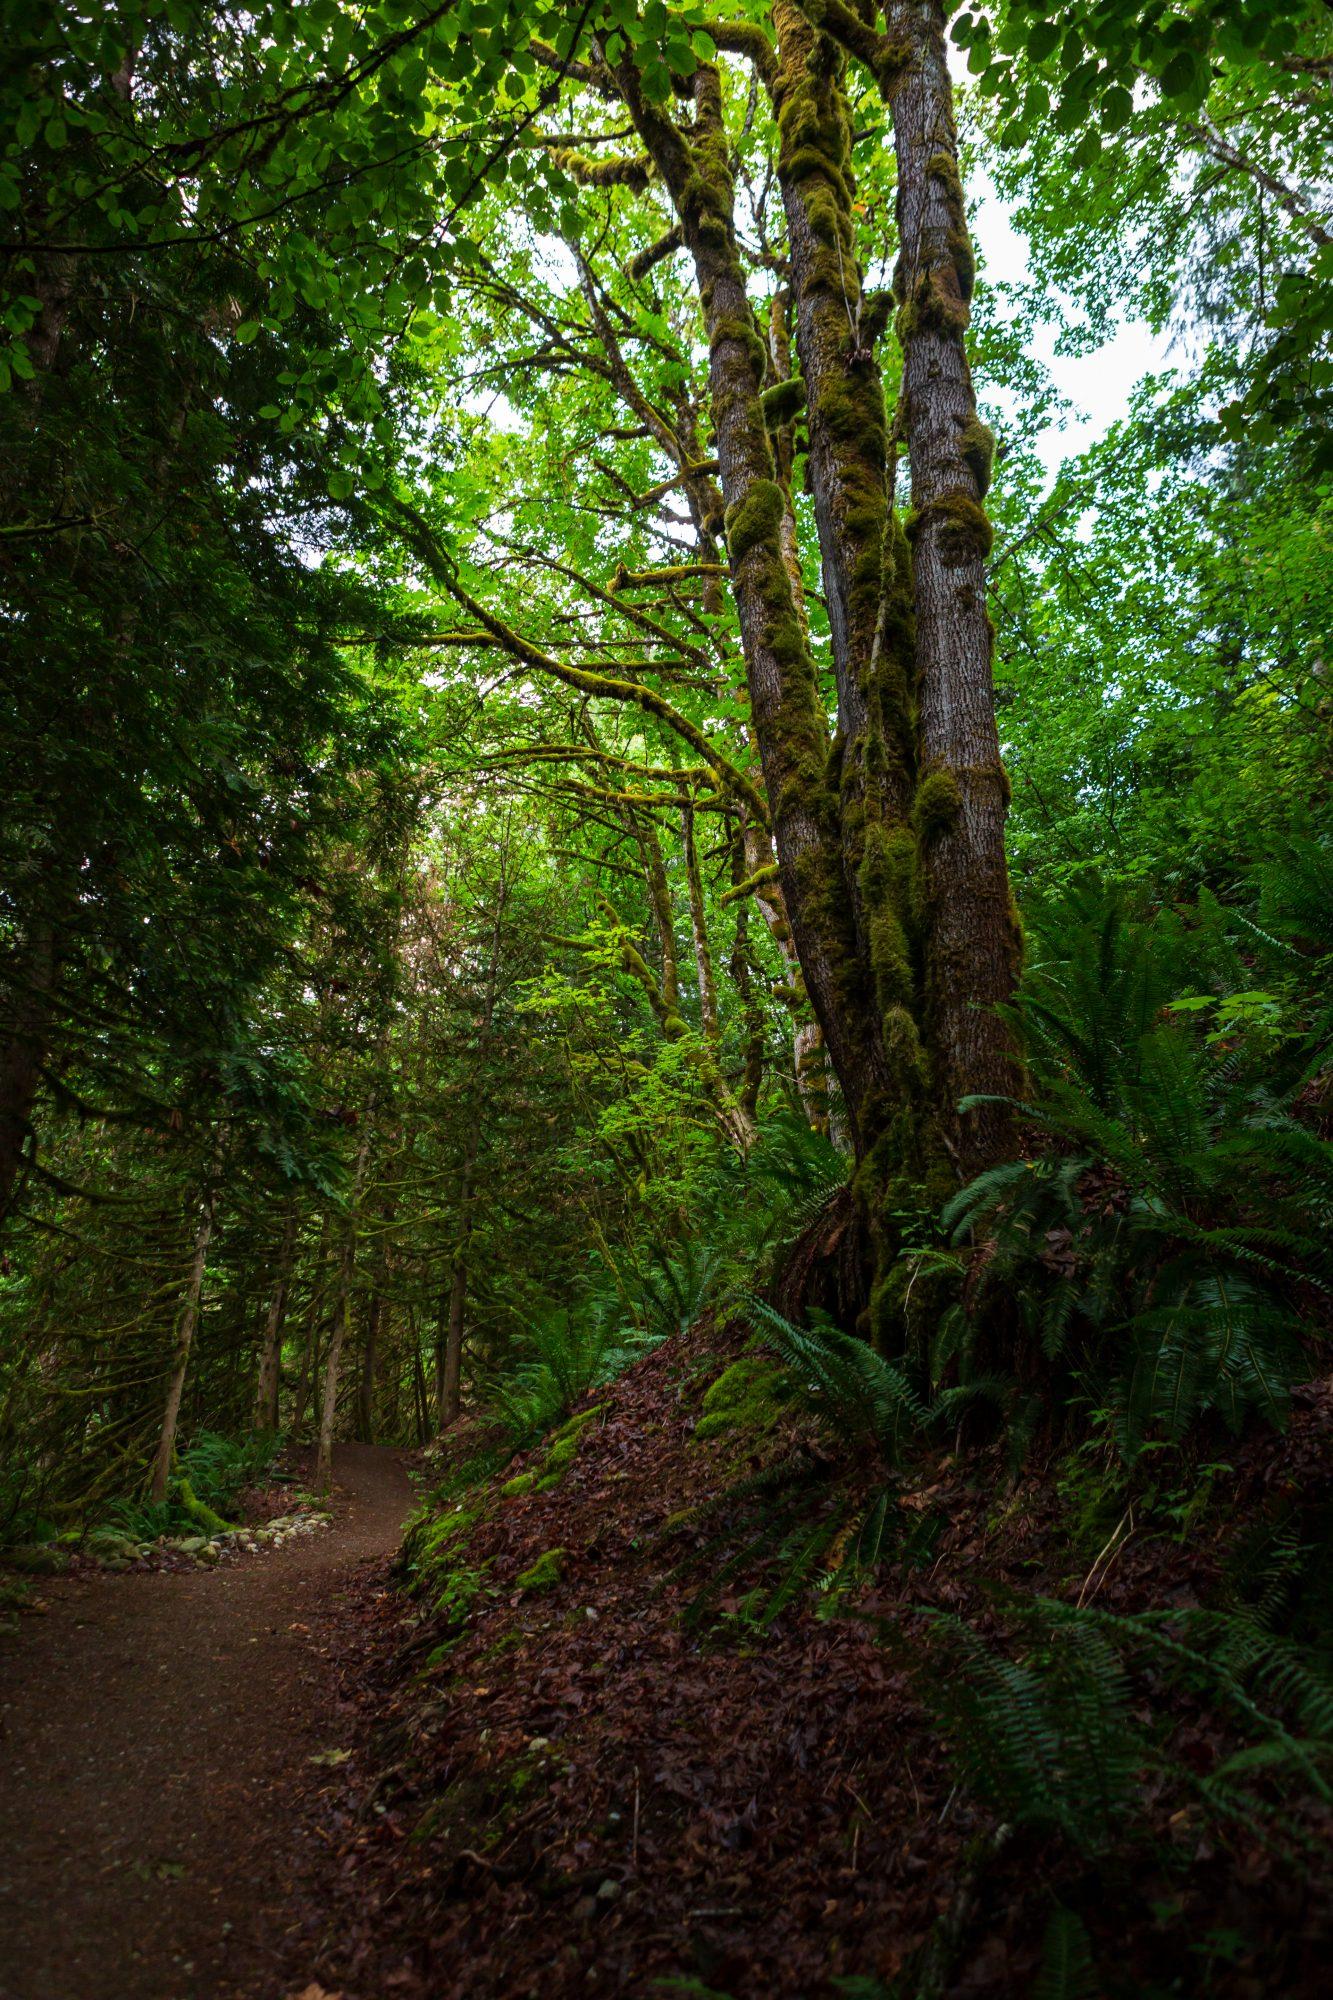 Trans Canada Trail - Hope, British Columbia  - Tracey Sawatzky, Adventure Photographer